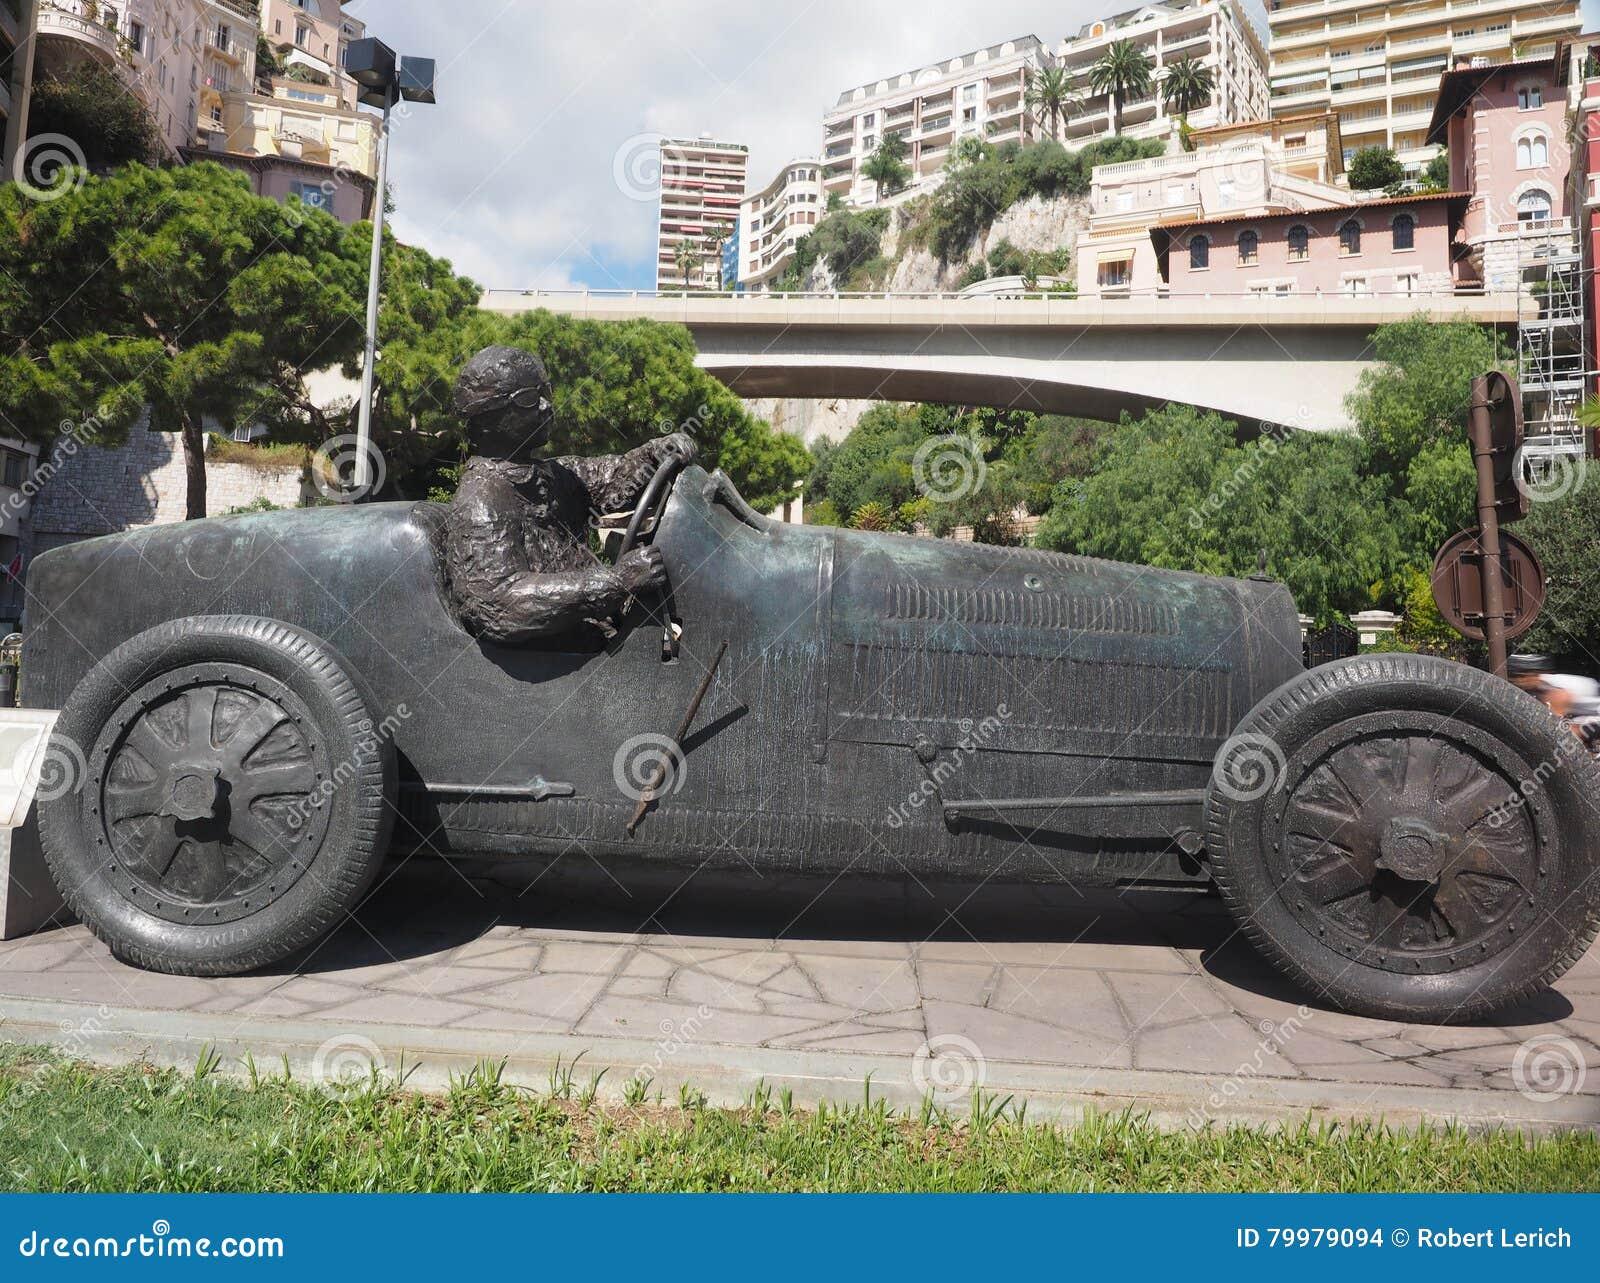 Sculpture Of Race Car And Driver Monte Carlo Monaco Stock Photo ...